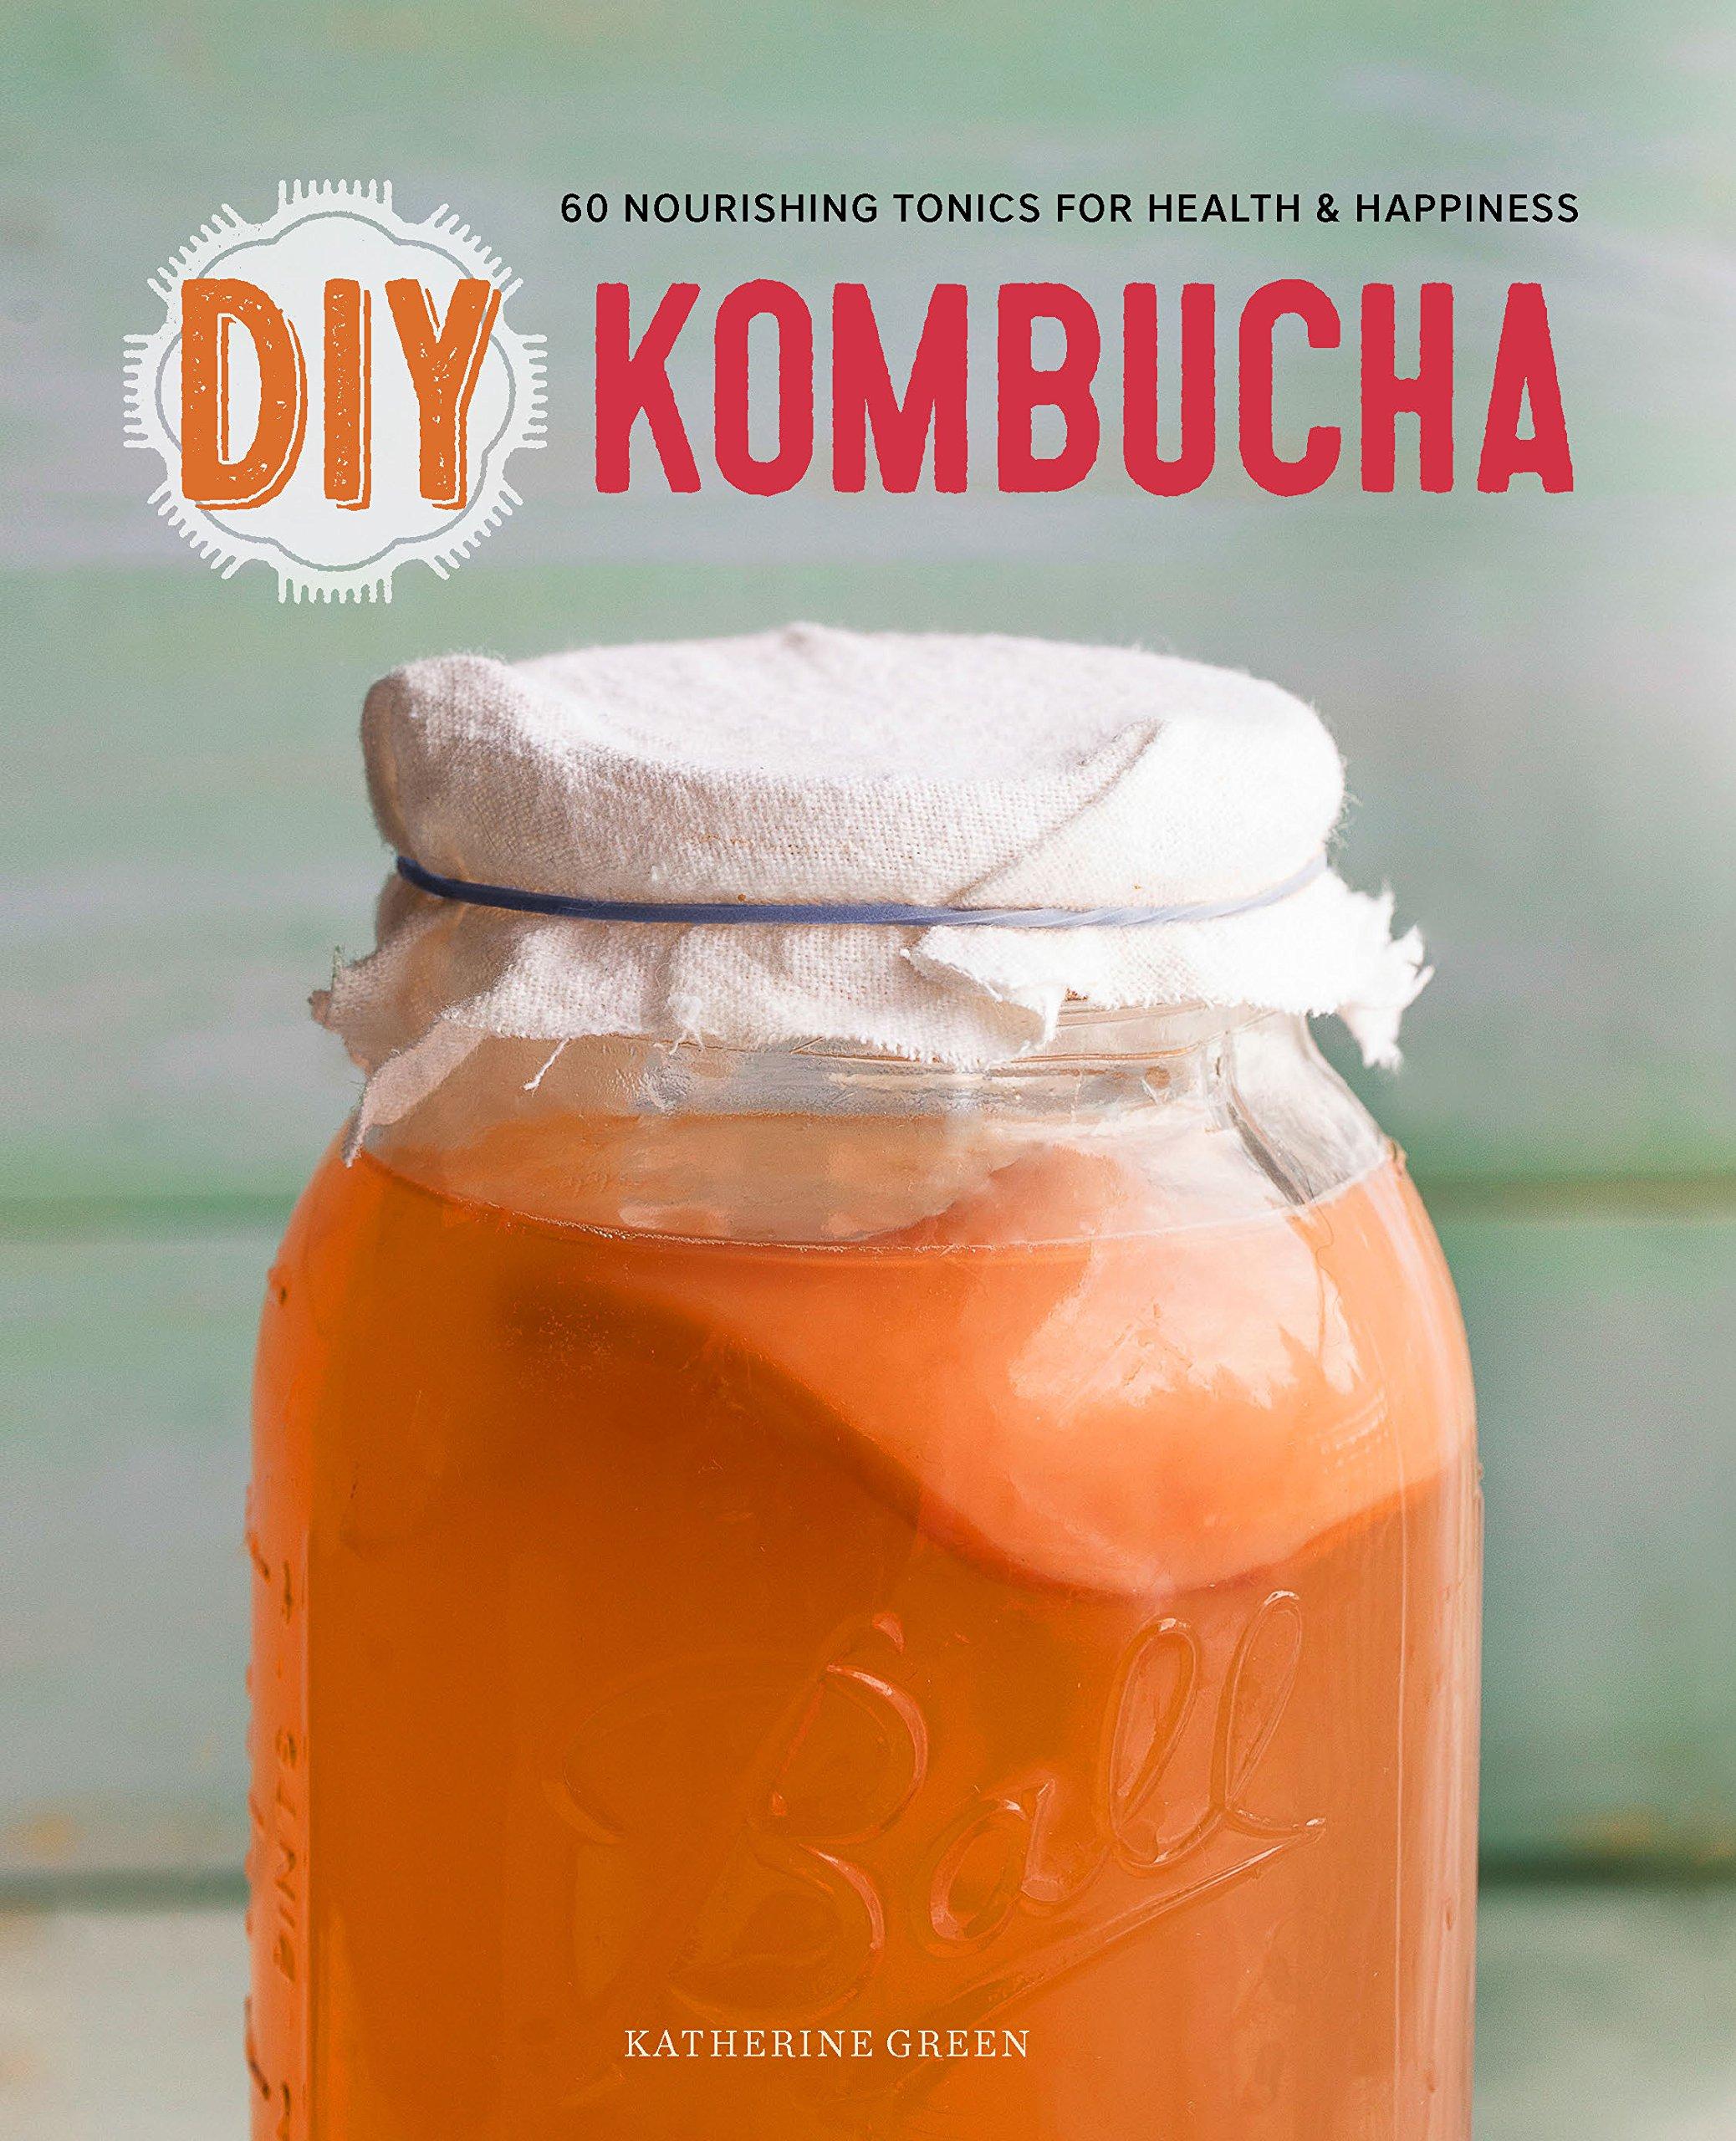 DIY Kombucha: 60 Nourishing Homemade Tonics for Health and Happiness:  Rockridge Press: 9781623154752: Amazon.com: Books